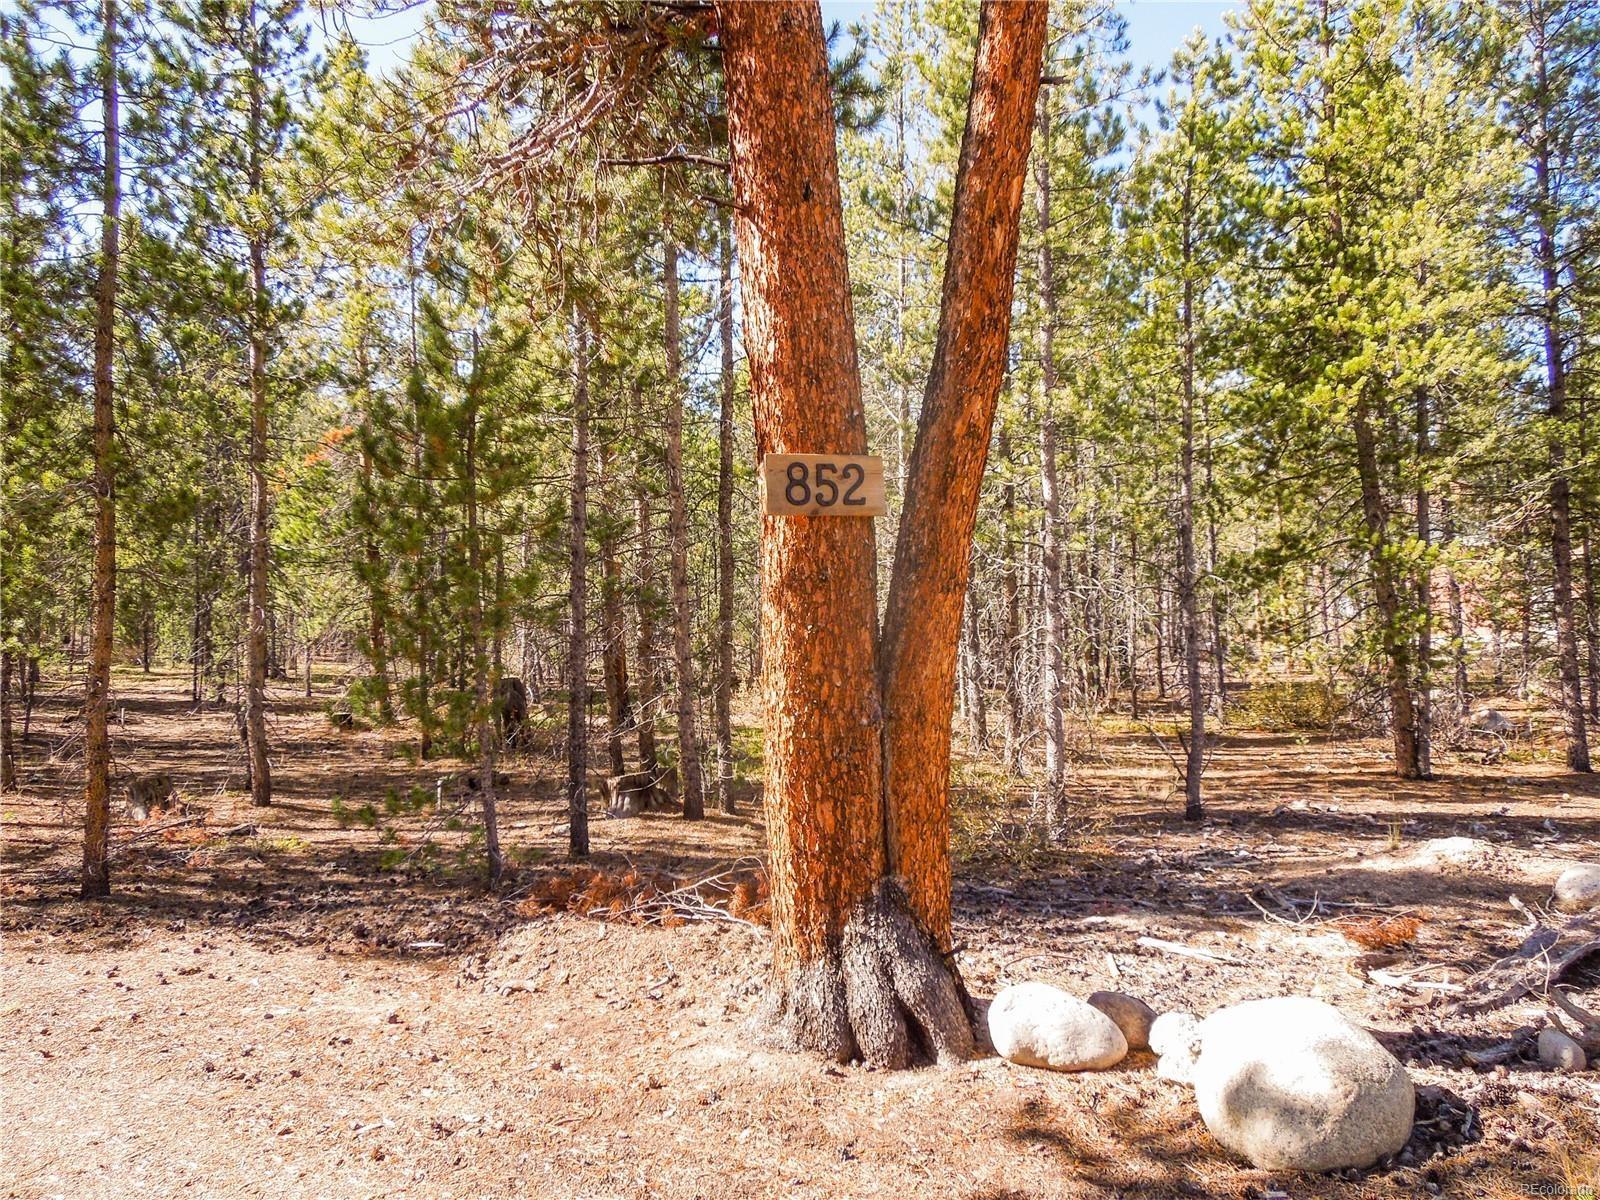 MLS# 8179364 - 10 - 852 Birch Drive, Twin Lakes, CO 81251